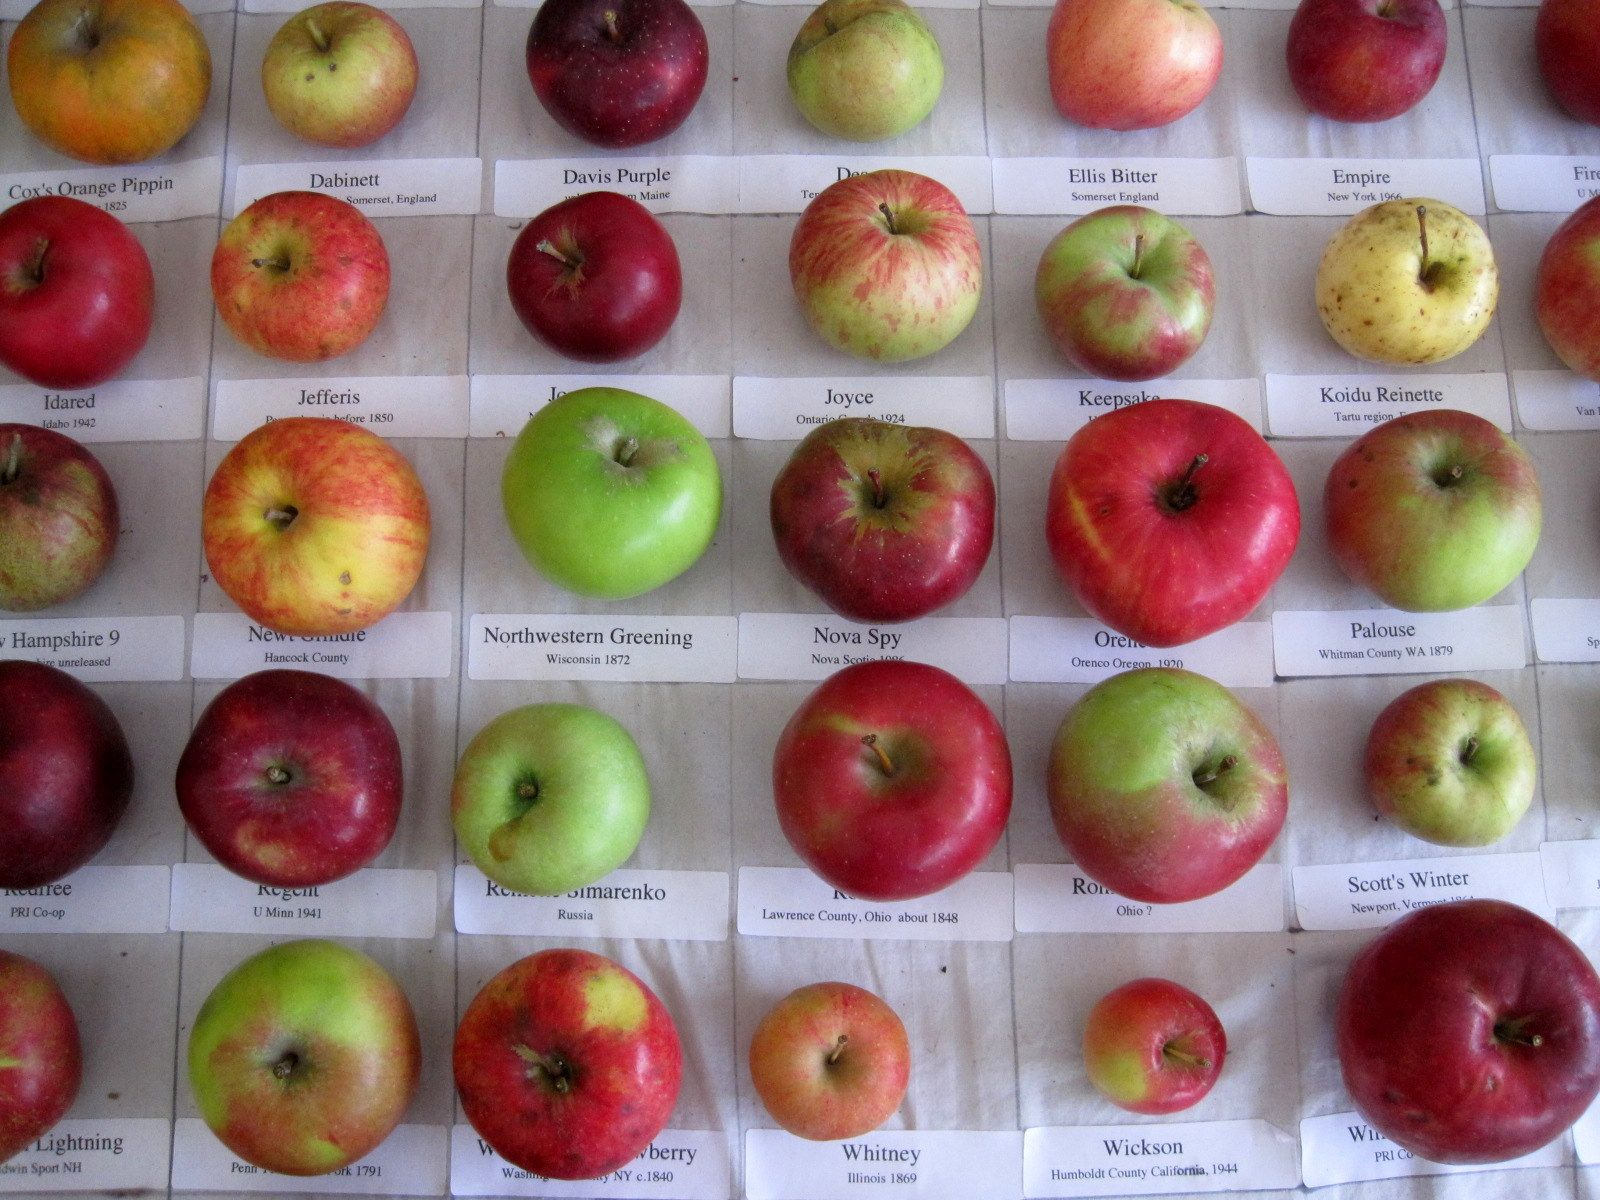 Pin By Robyn Madison On Heritage Apples Apple Varieties Apple Apple Help